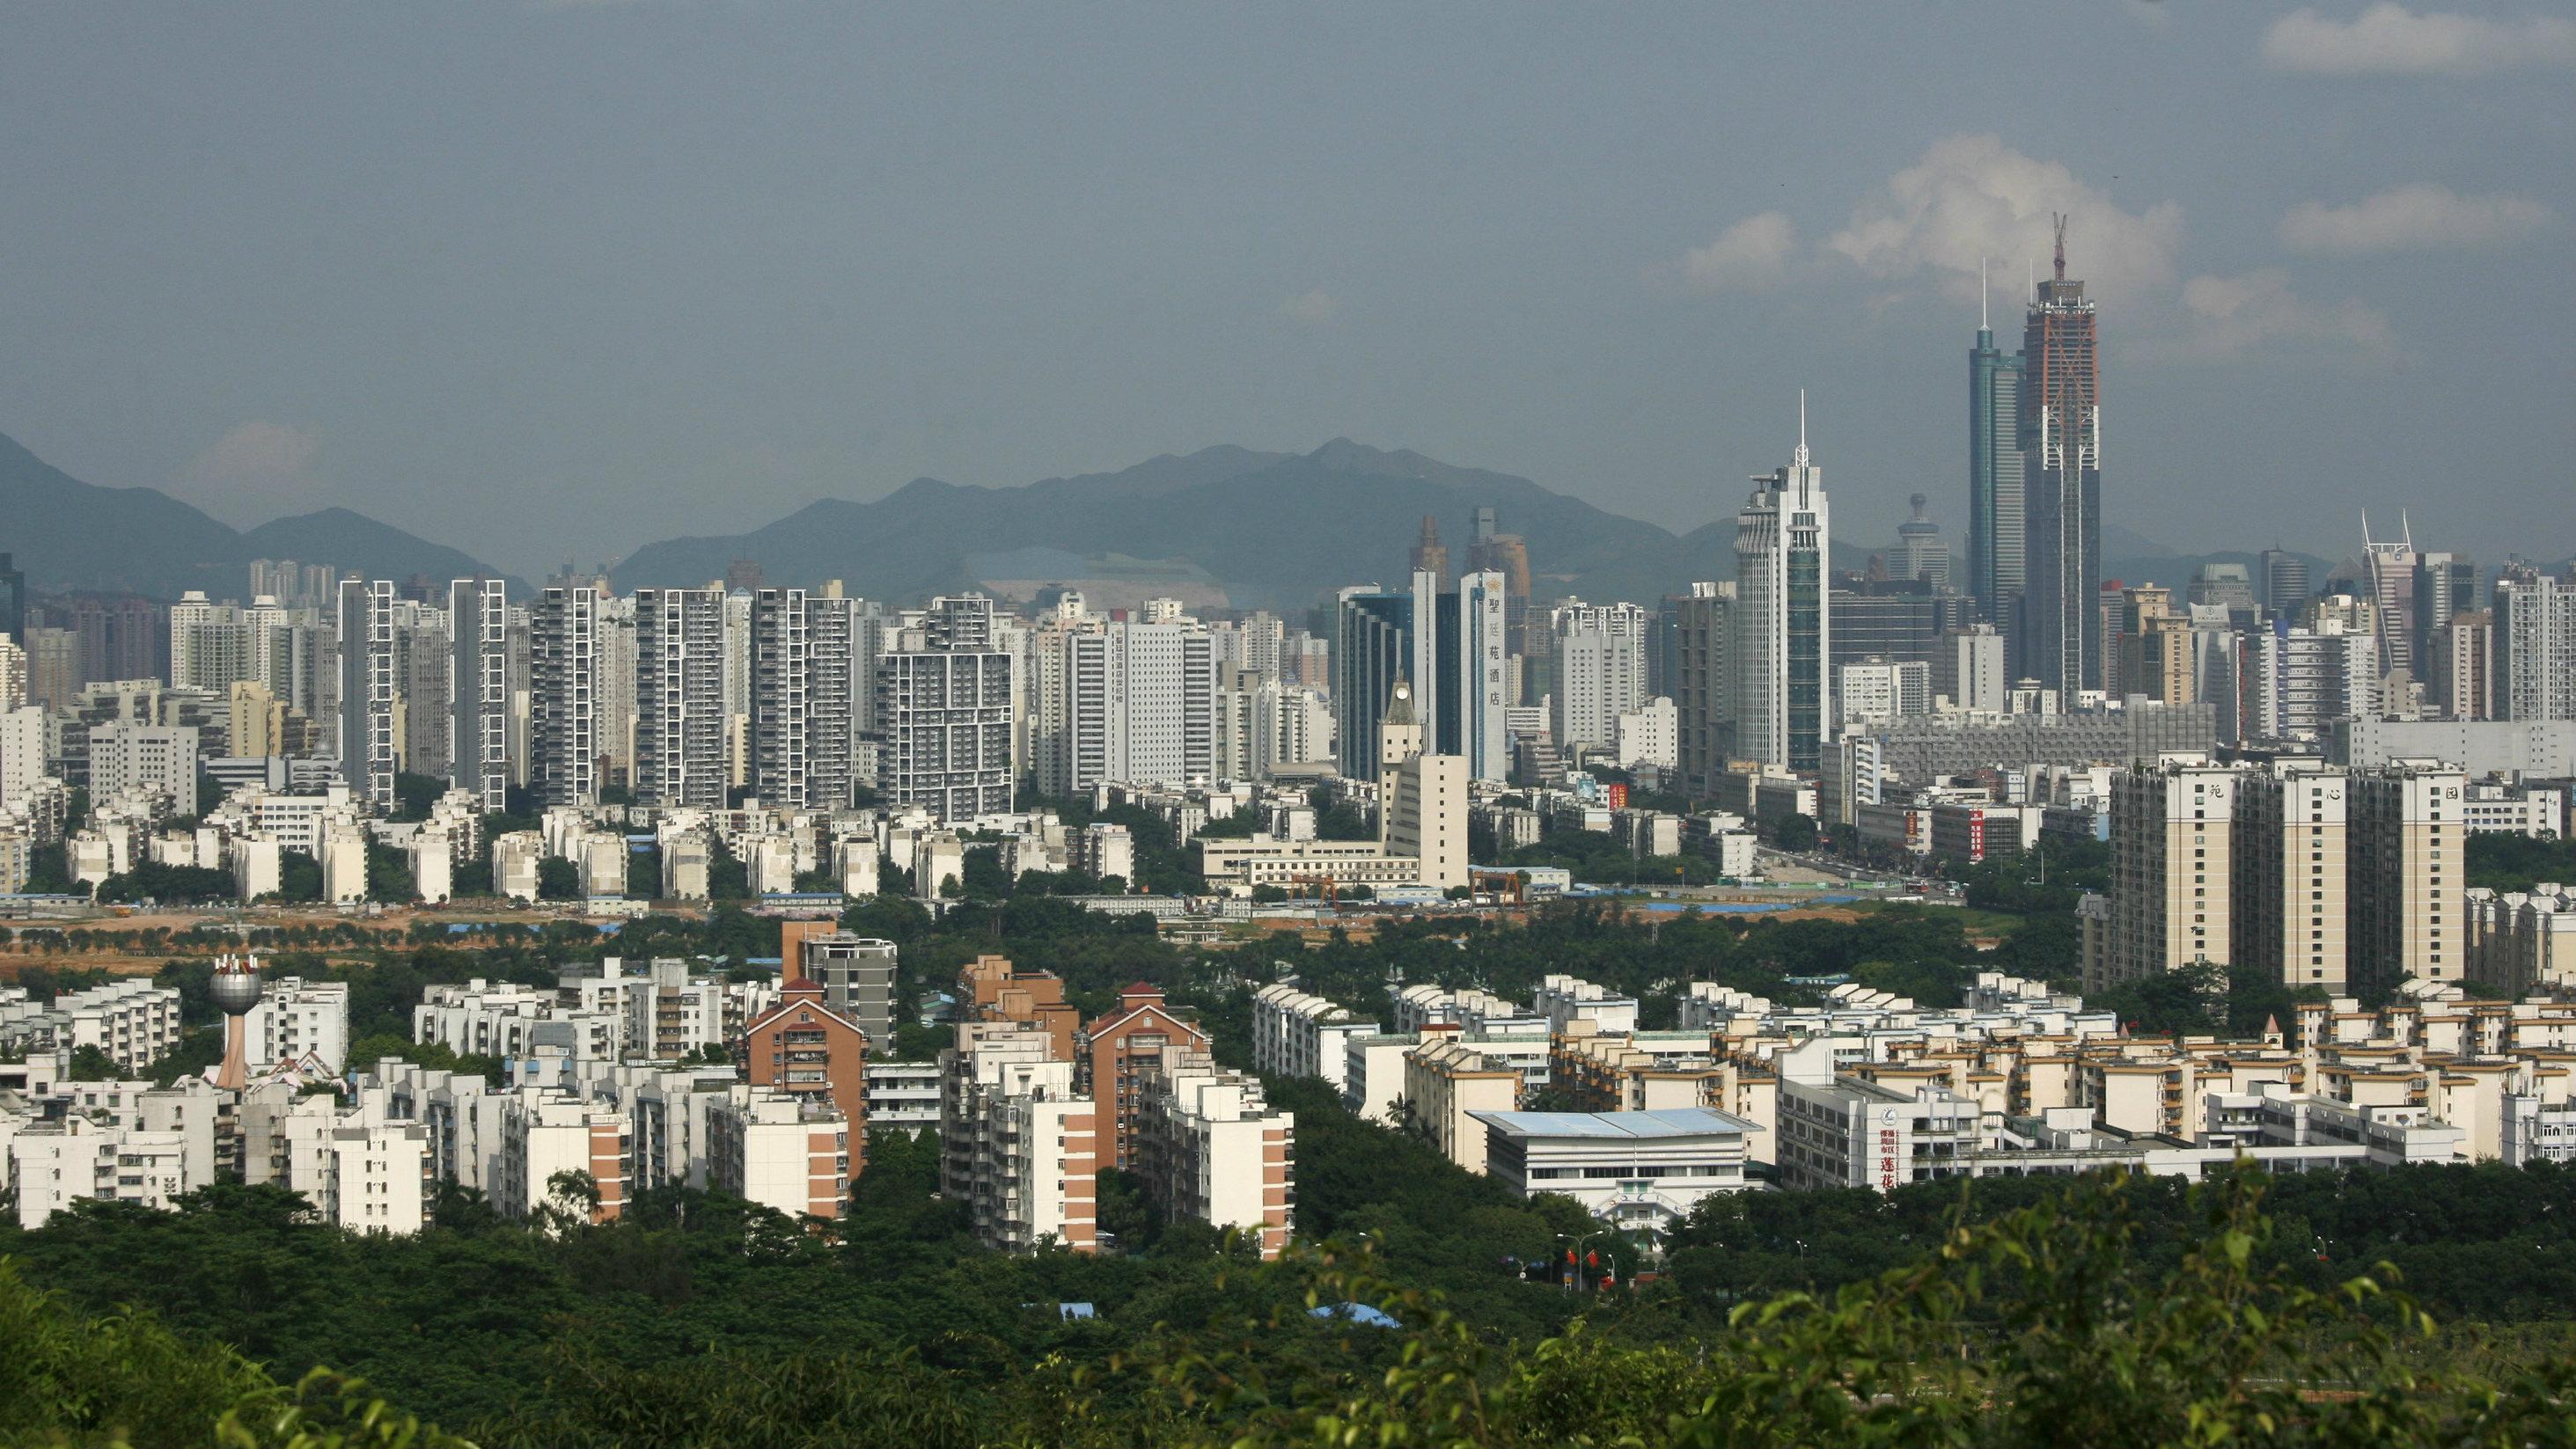 Shenzhen, China's hardware manufacturing hub.